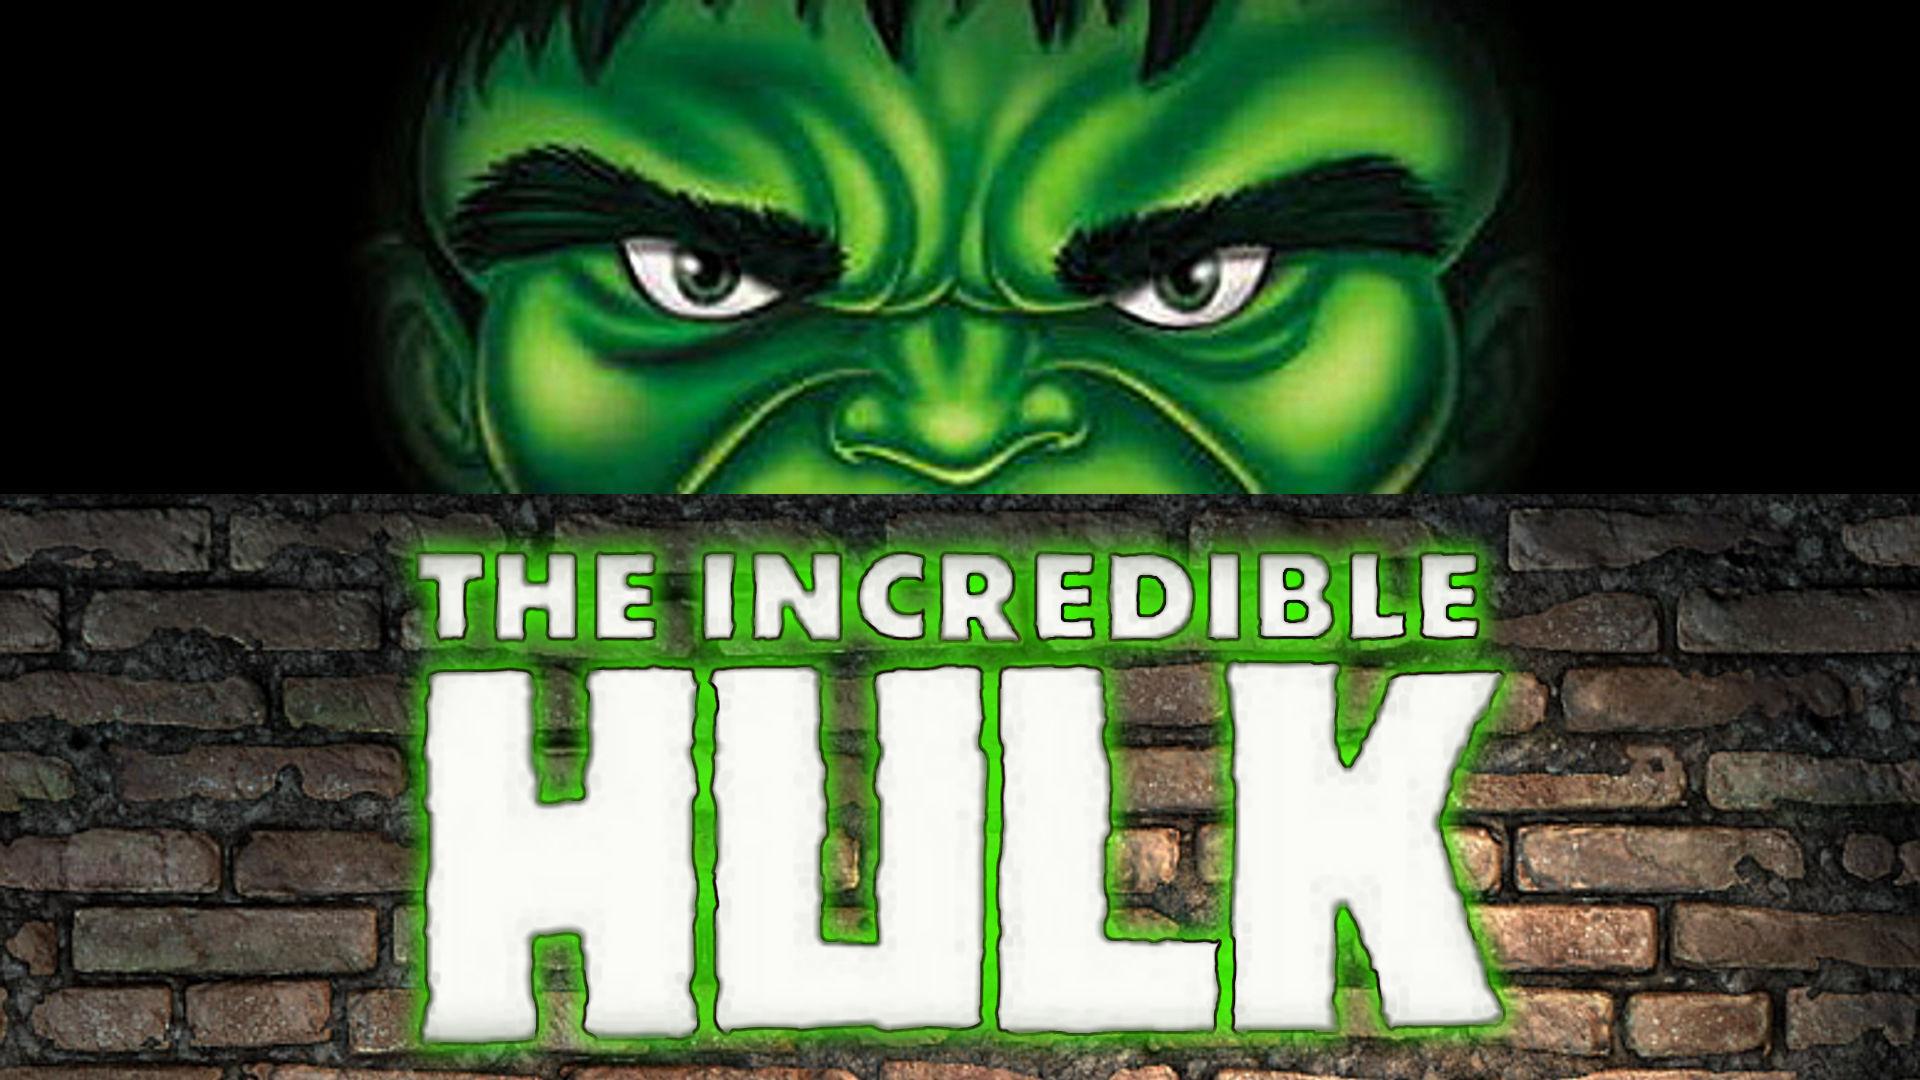 The Incredible Hulk episodes (TV Series 1982 - 1983)